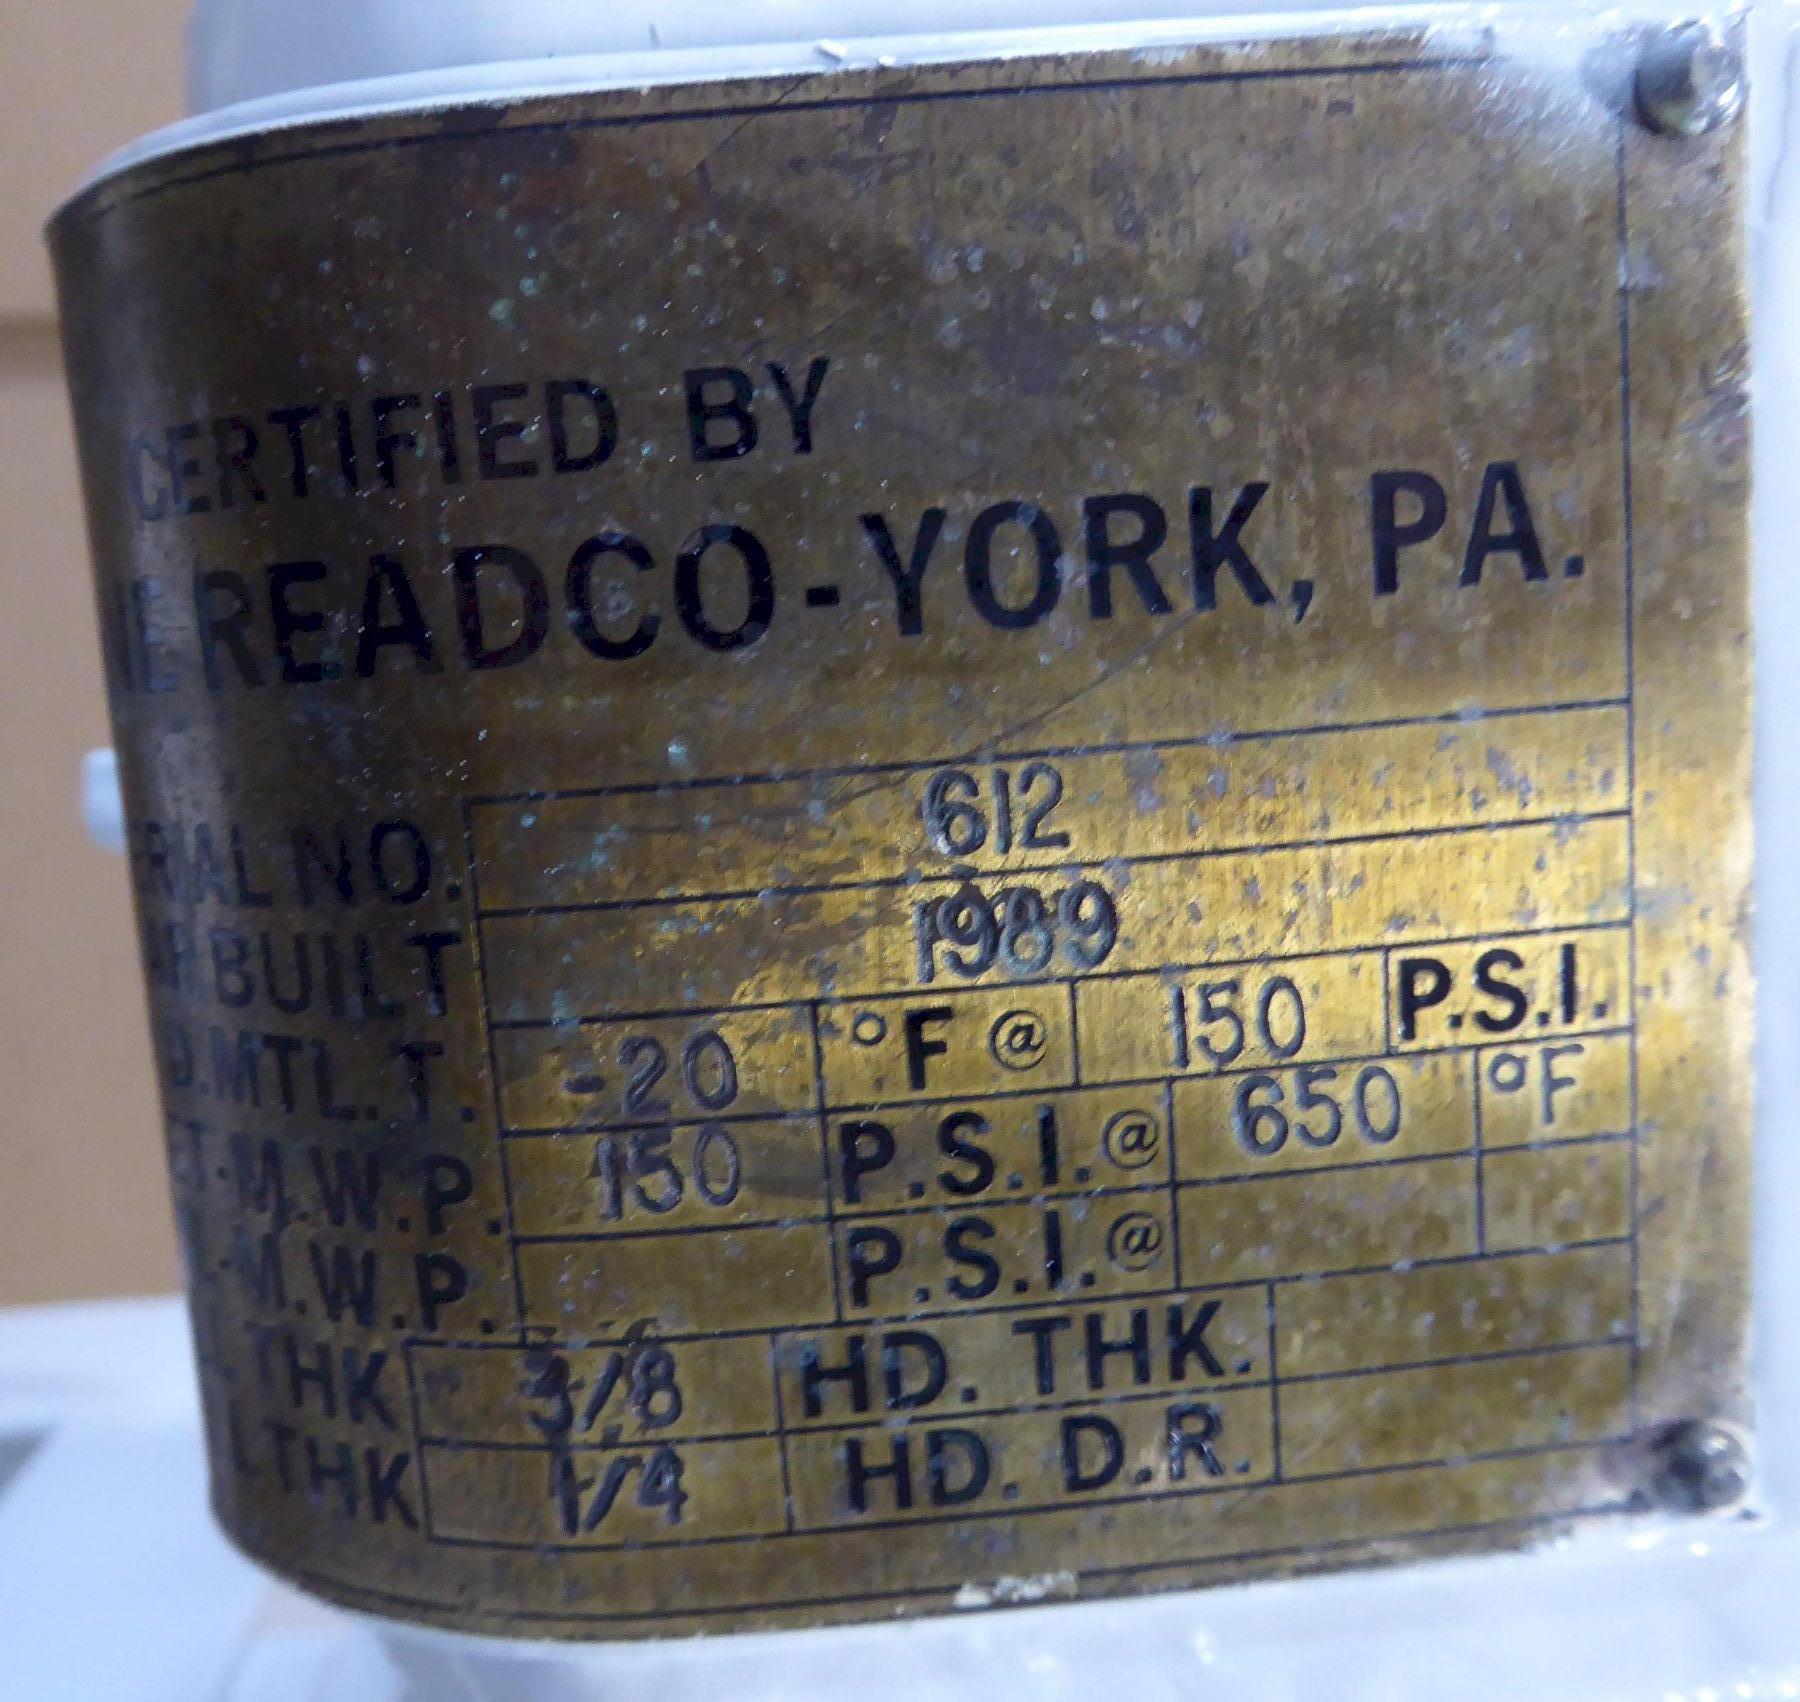 Teledyne Readco Laboratory Mixer Model 107673, 1 Quart Capacity, Stainless